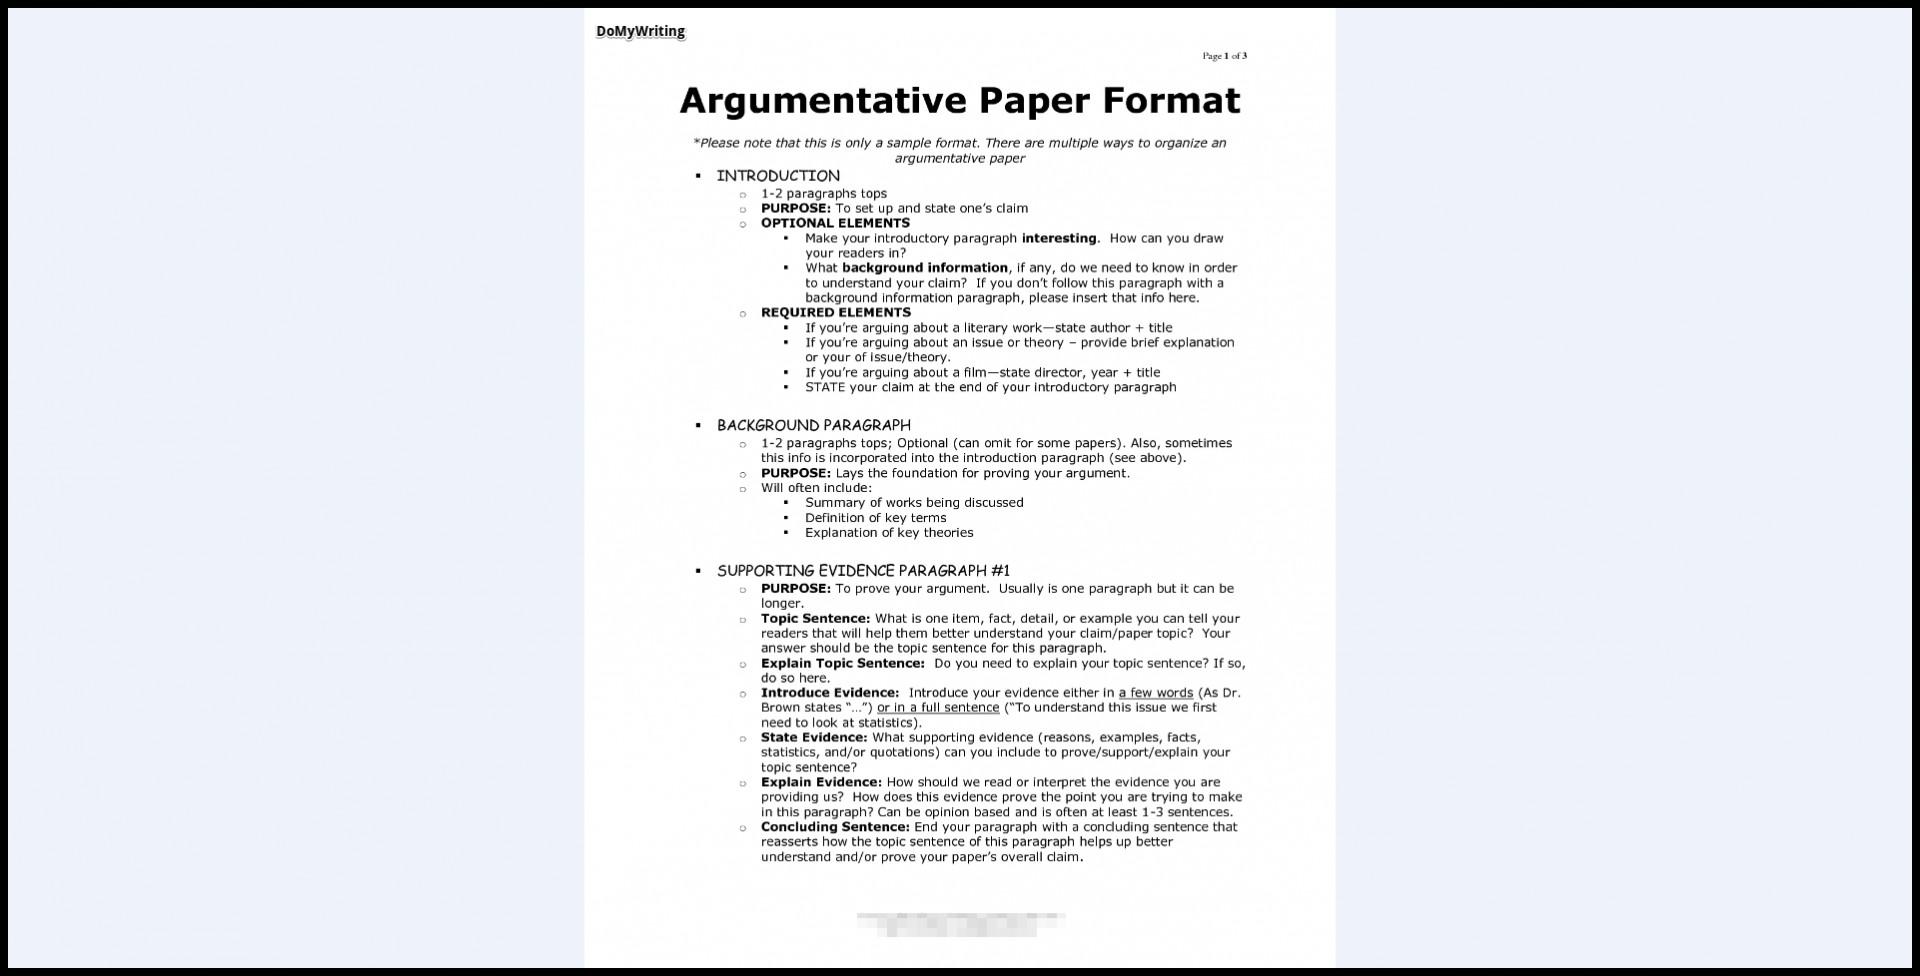 009 Essay Example Argumentative Format Controversial Excellent Topics Non Current 1920